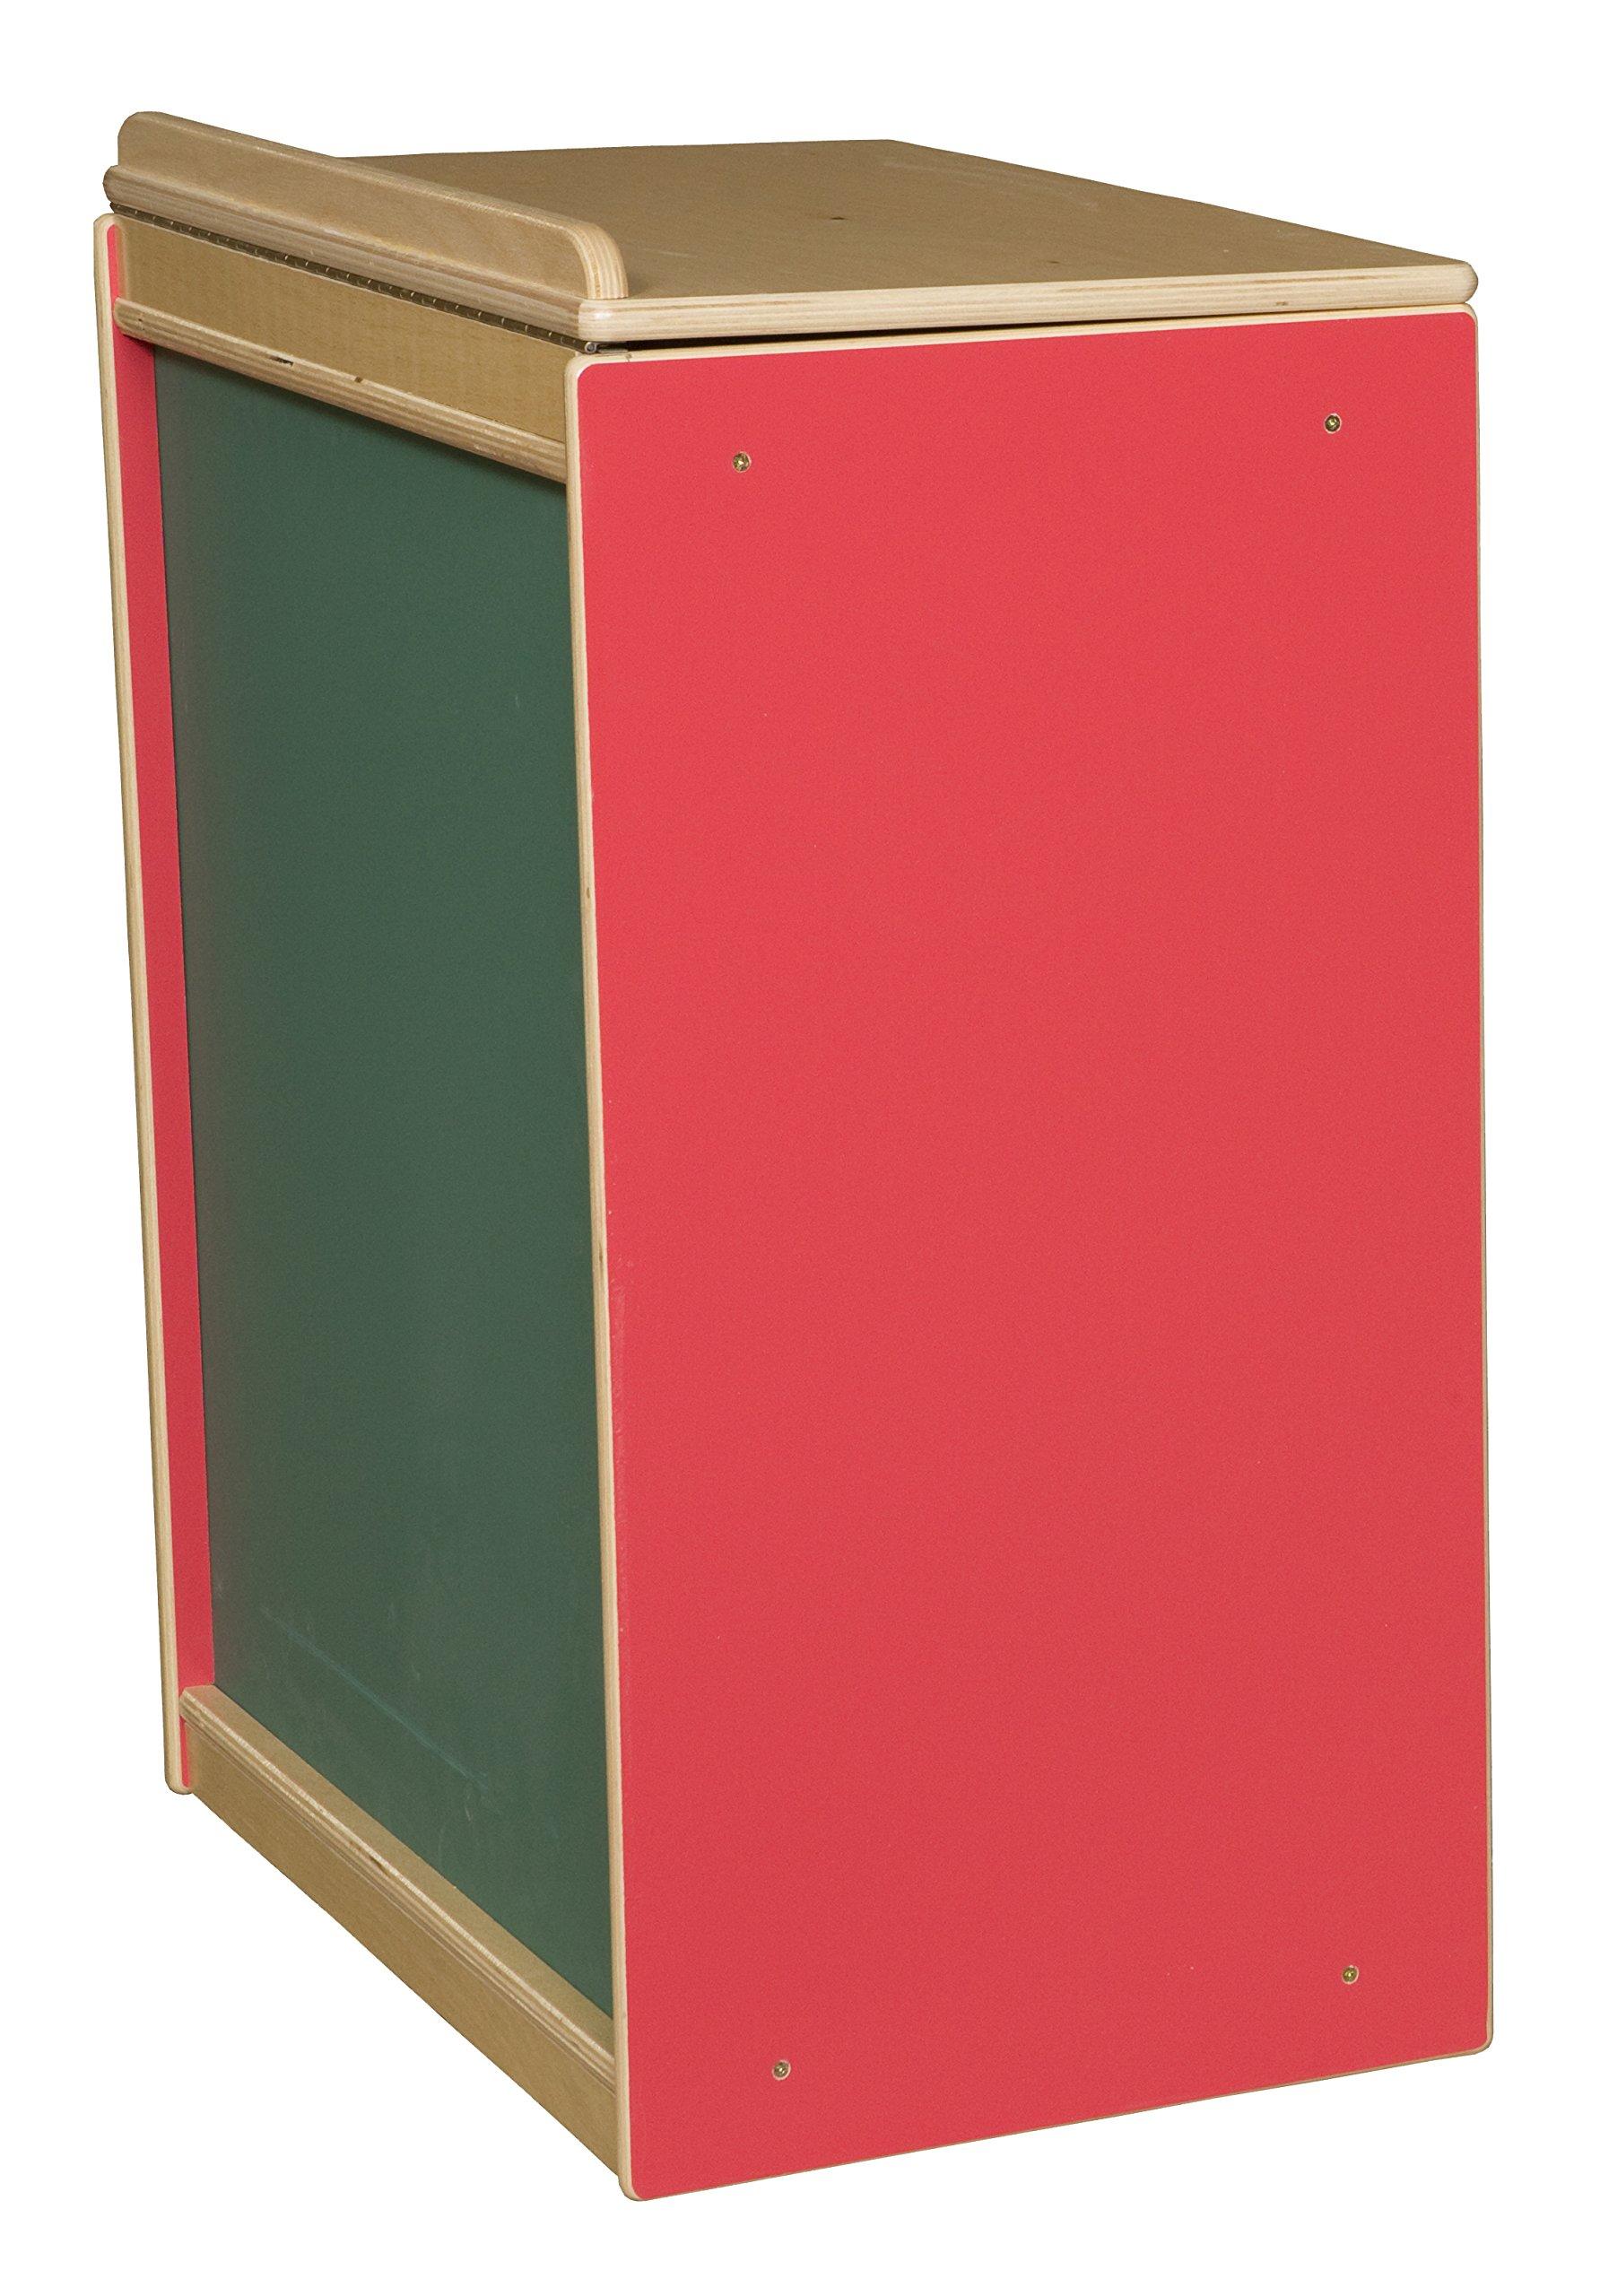 Wood Designs WD34100R Strawberry Red Big Book Storage / Display with Chalkboard